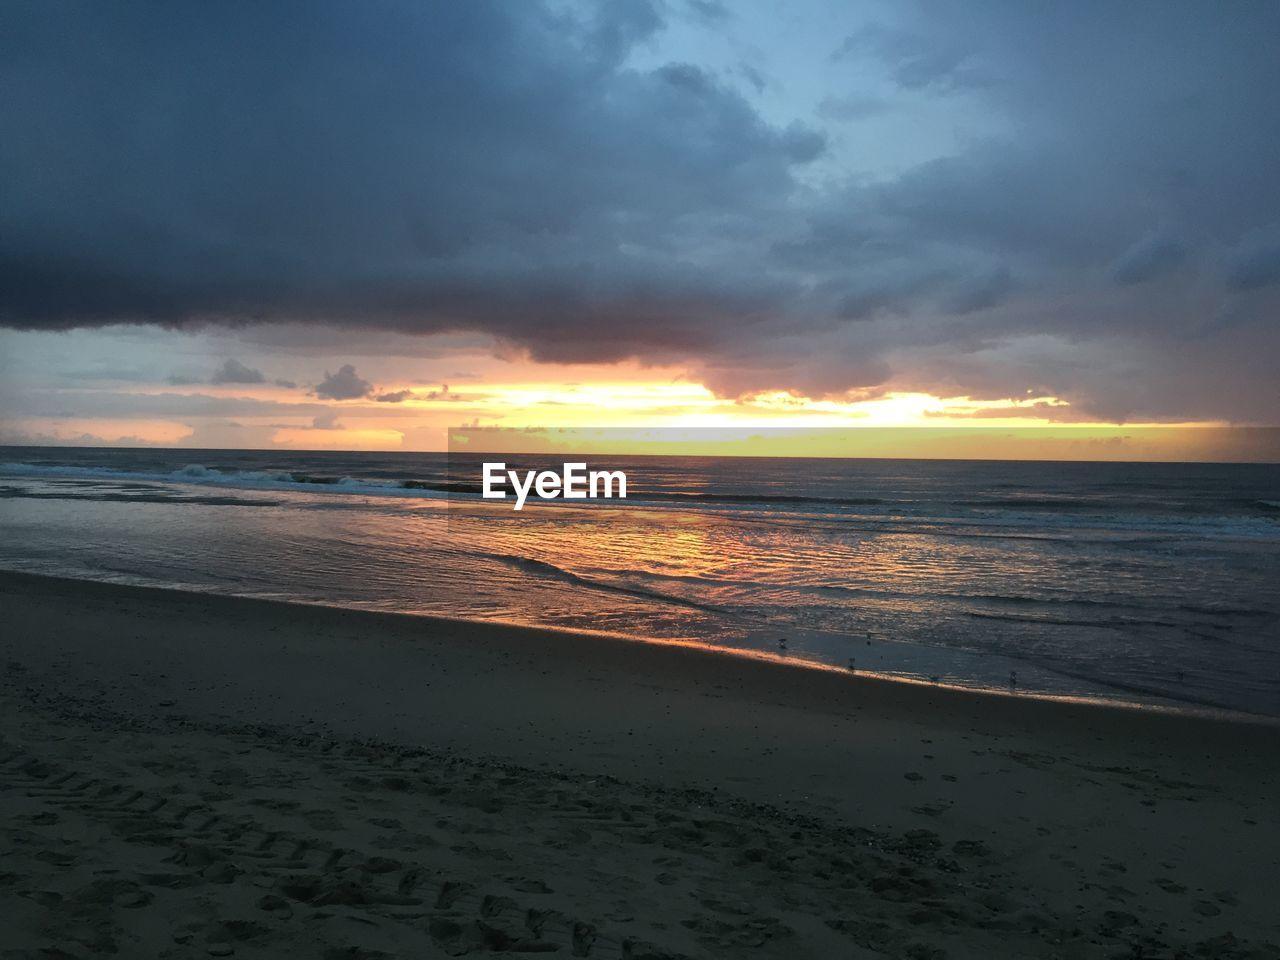 sea, sky, beach, land, water, sunset, beauty in nature, horizon, horizon over water, cloud - sky, scenics - nature, sand, tranquility, tranquil scene, nature, idyllic, no people, non-urban scene, outdoors